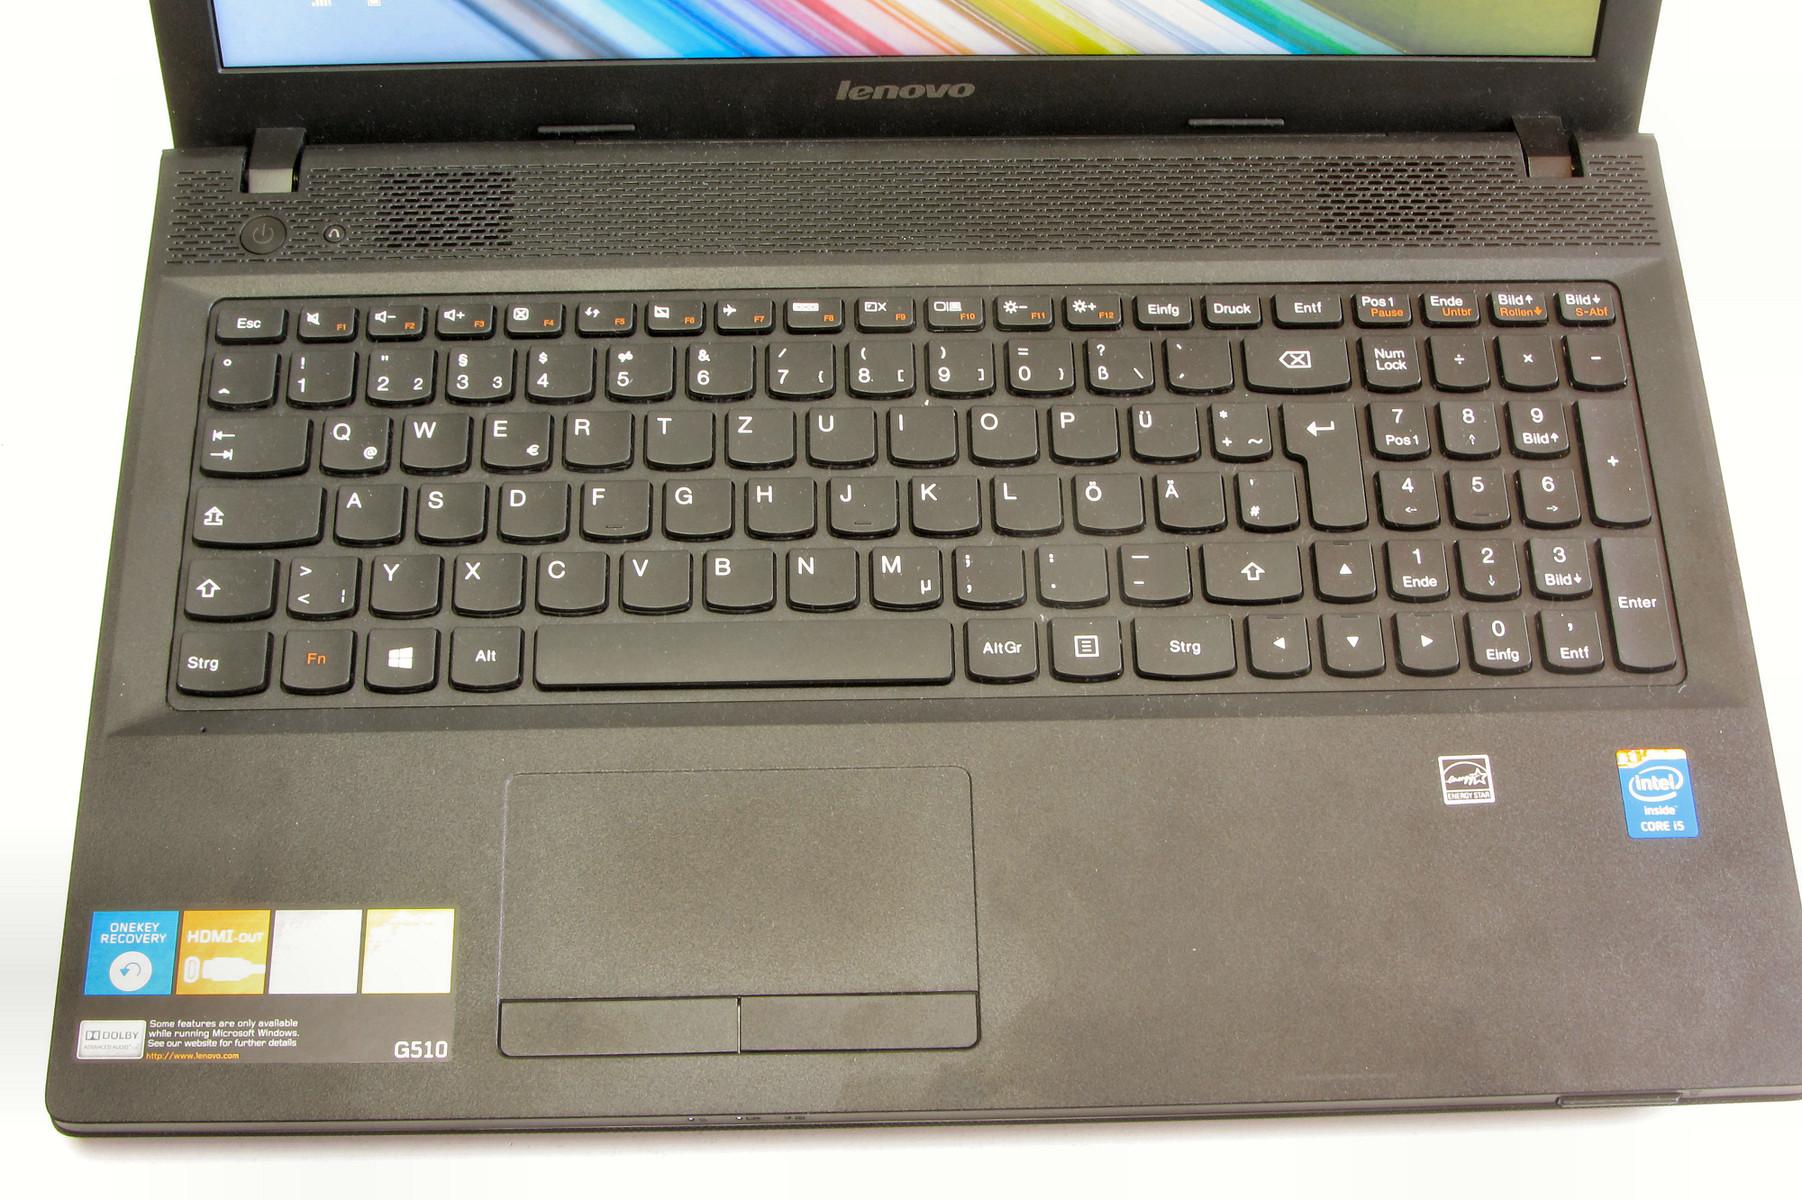 Test update lenovo g510 59416358 notebook notebookcheck.com tests